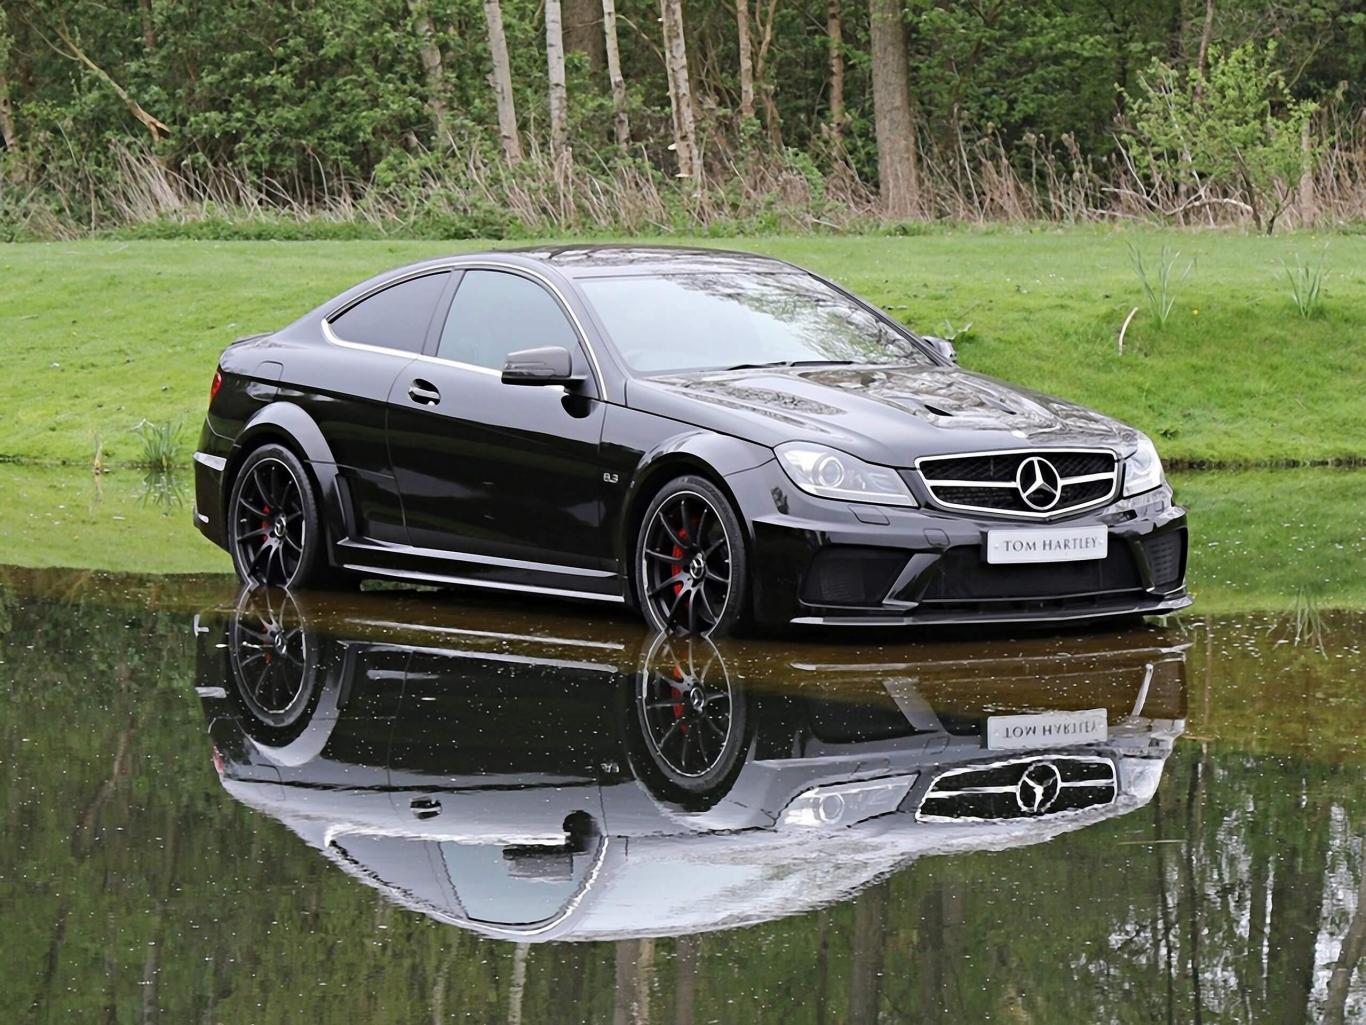 C63 Amg Black Series >> Mercedes Benz C63 Amg Black Series